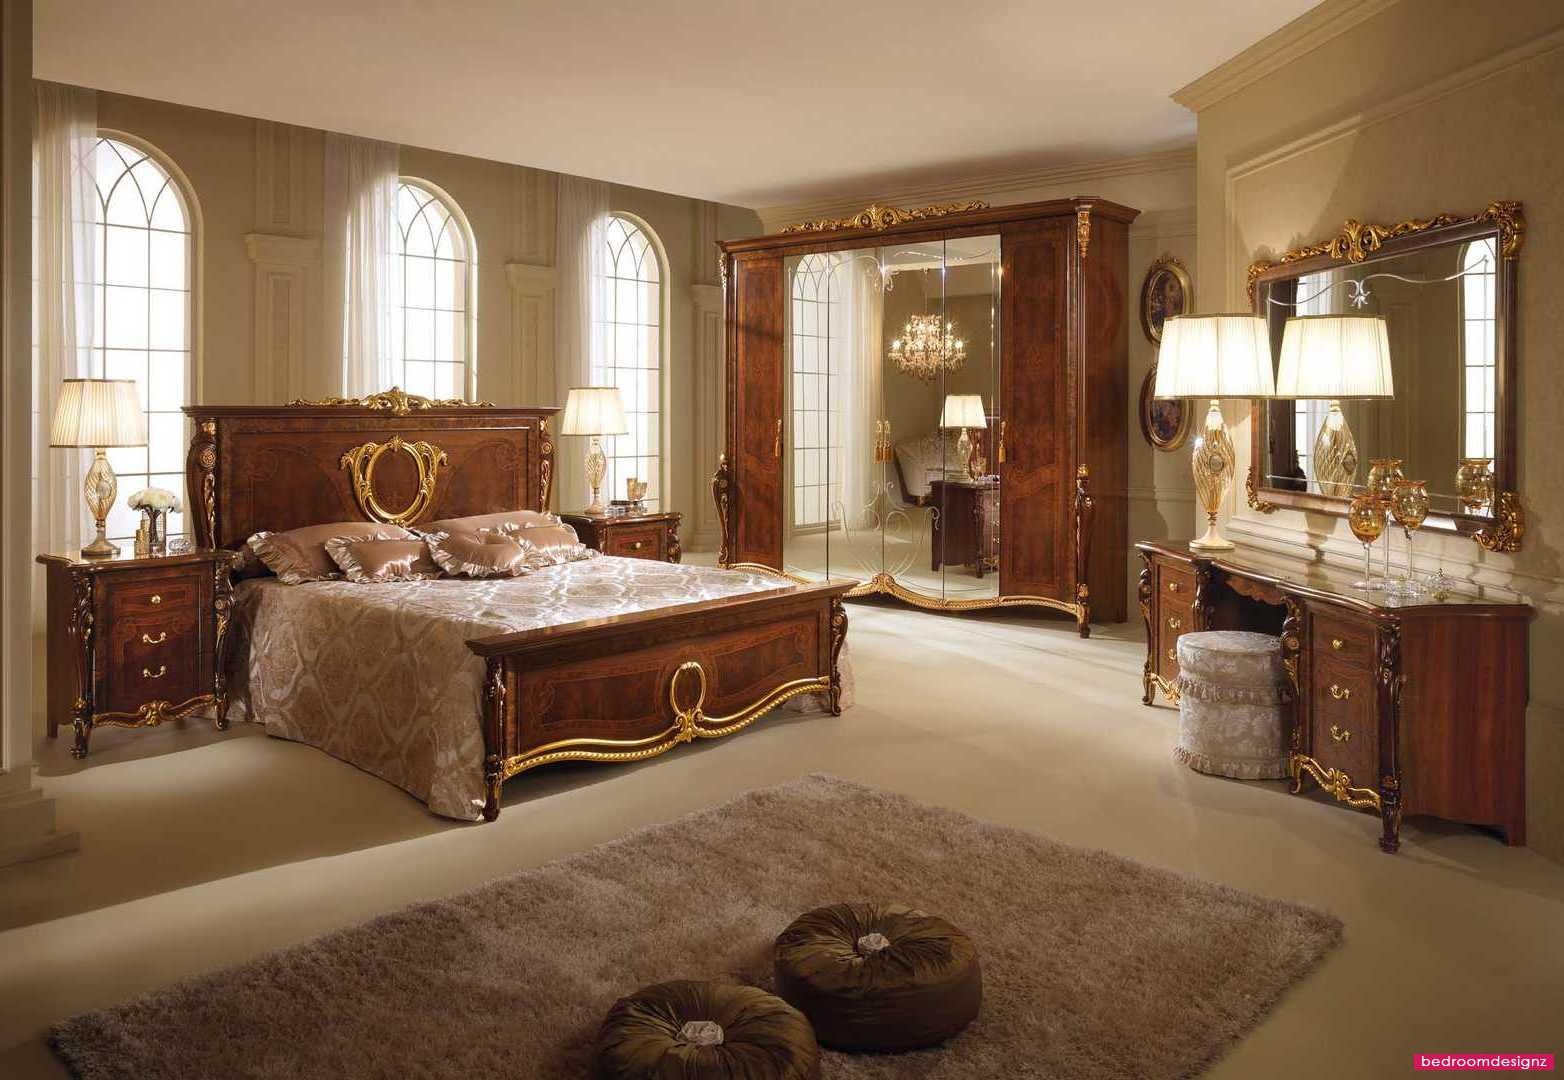 Bathroom best bedroom furniture sets bedroom design decorating ideas in where to buy best bedroom furniture